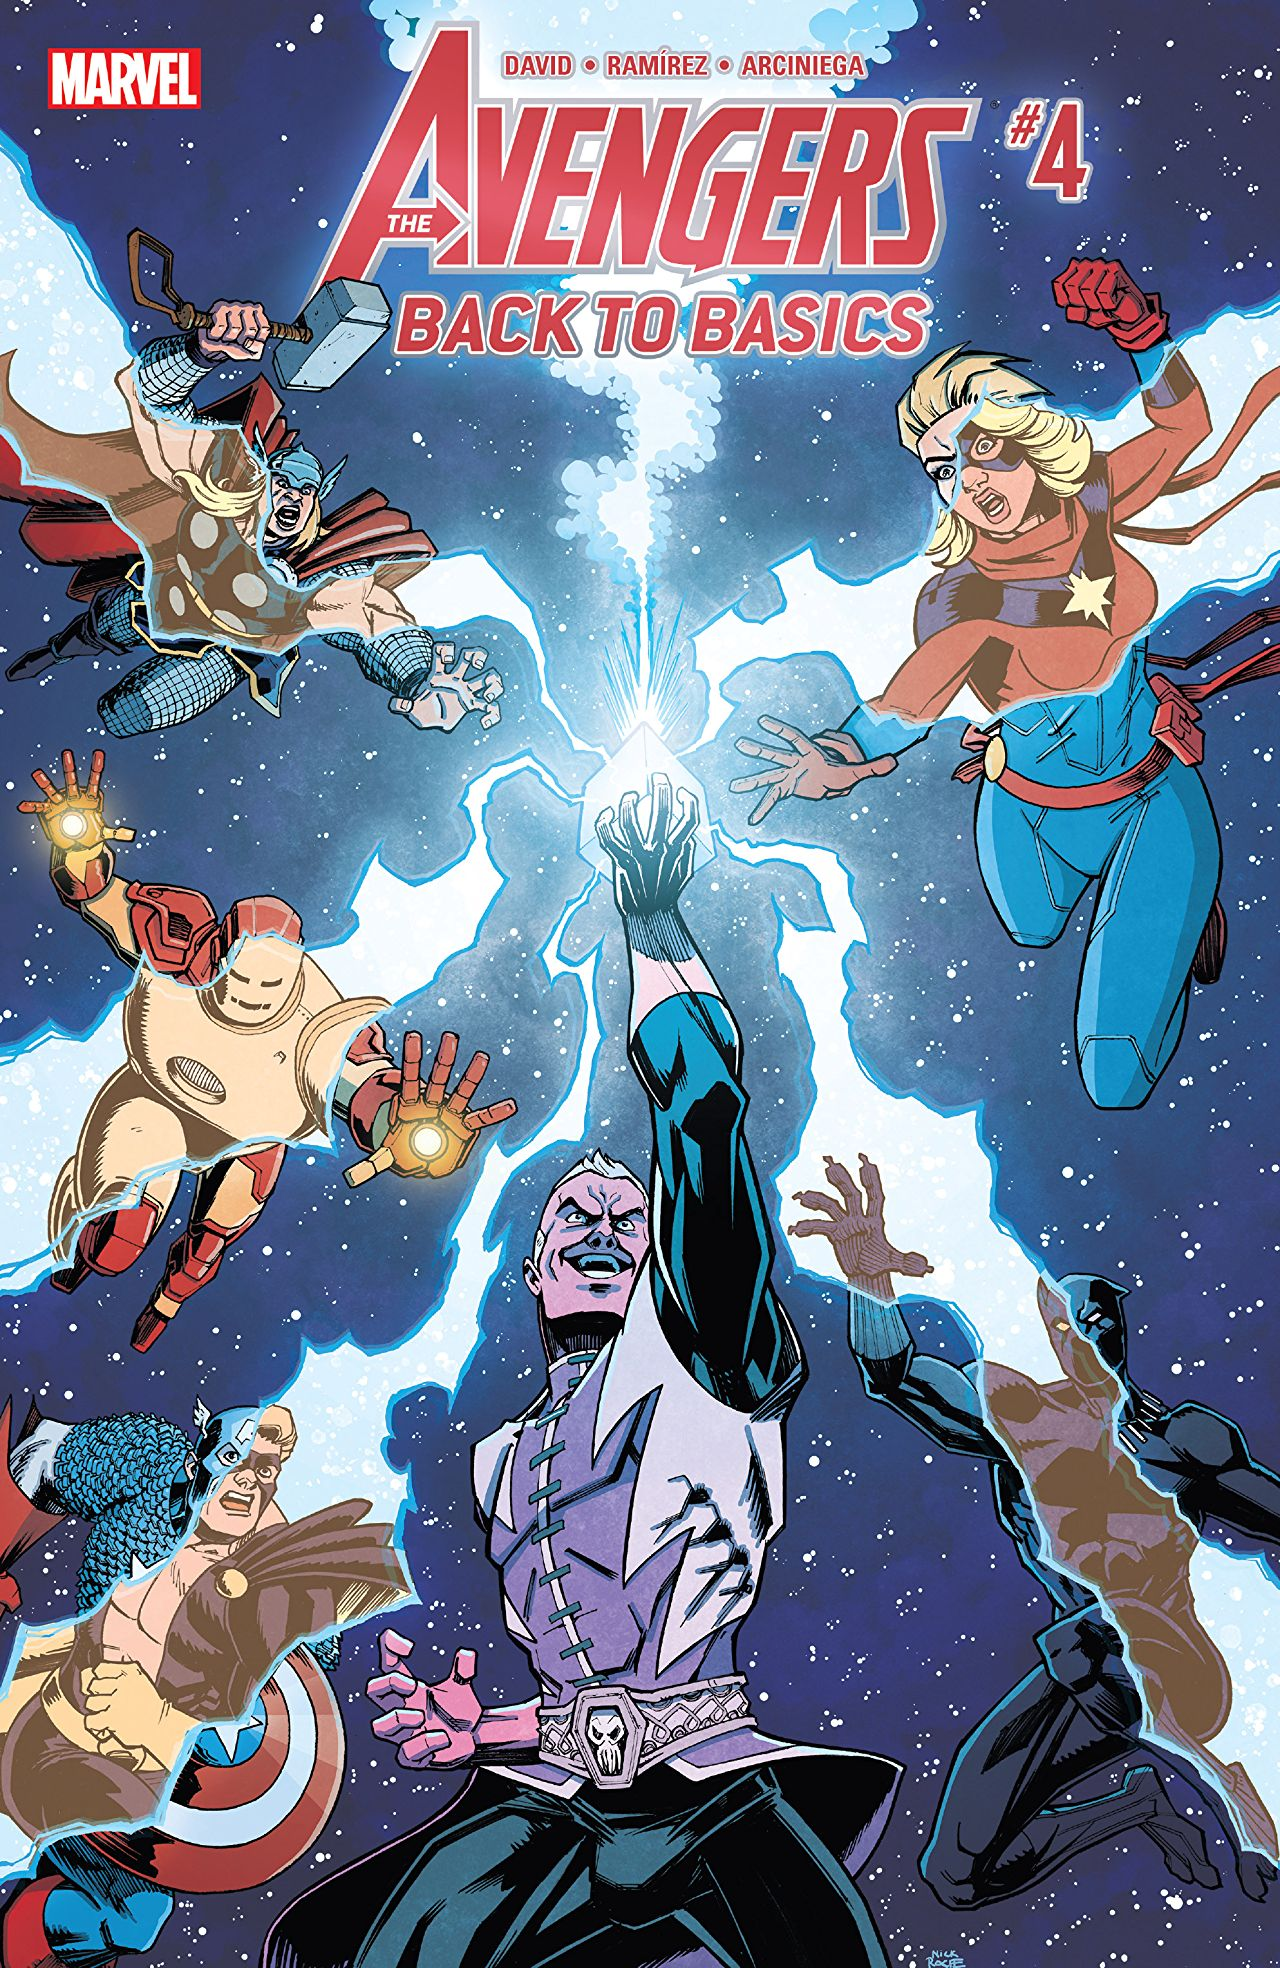 Avengers: Back to Basics Vol 1 4